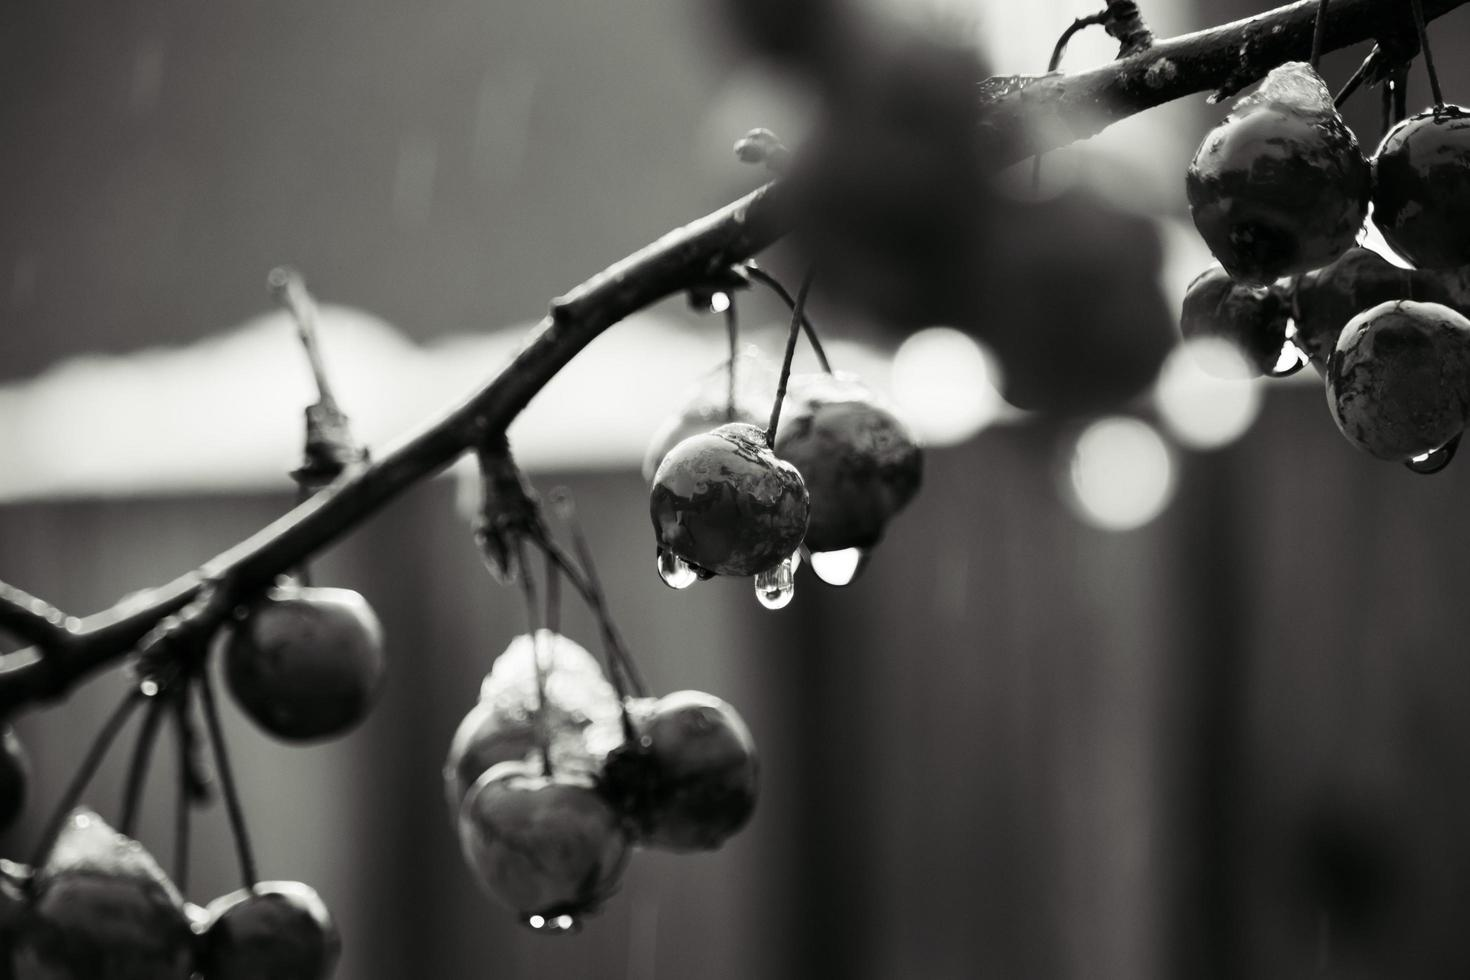 Grayscale photo of wild berries